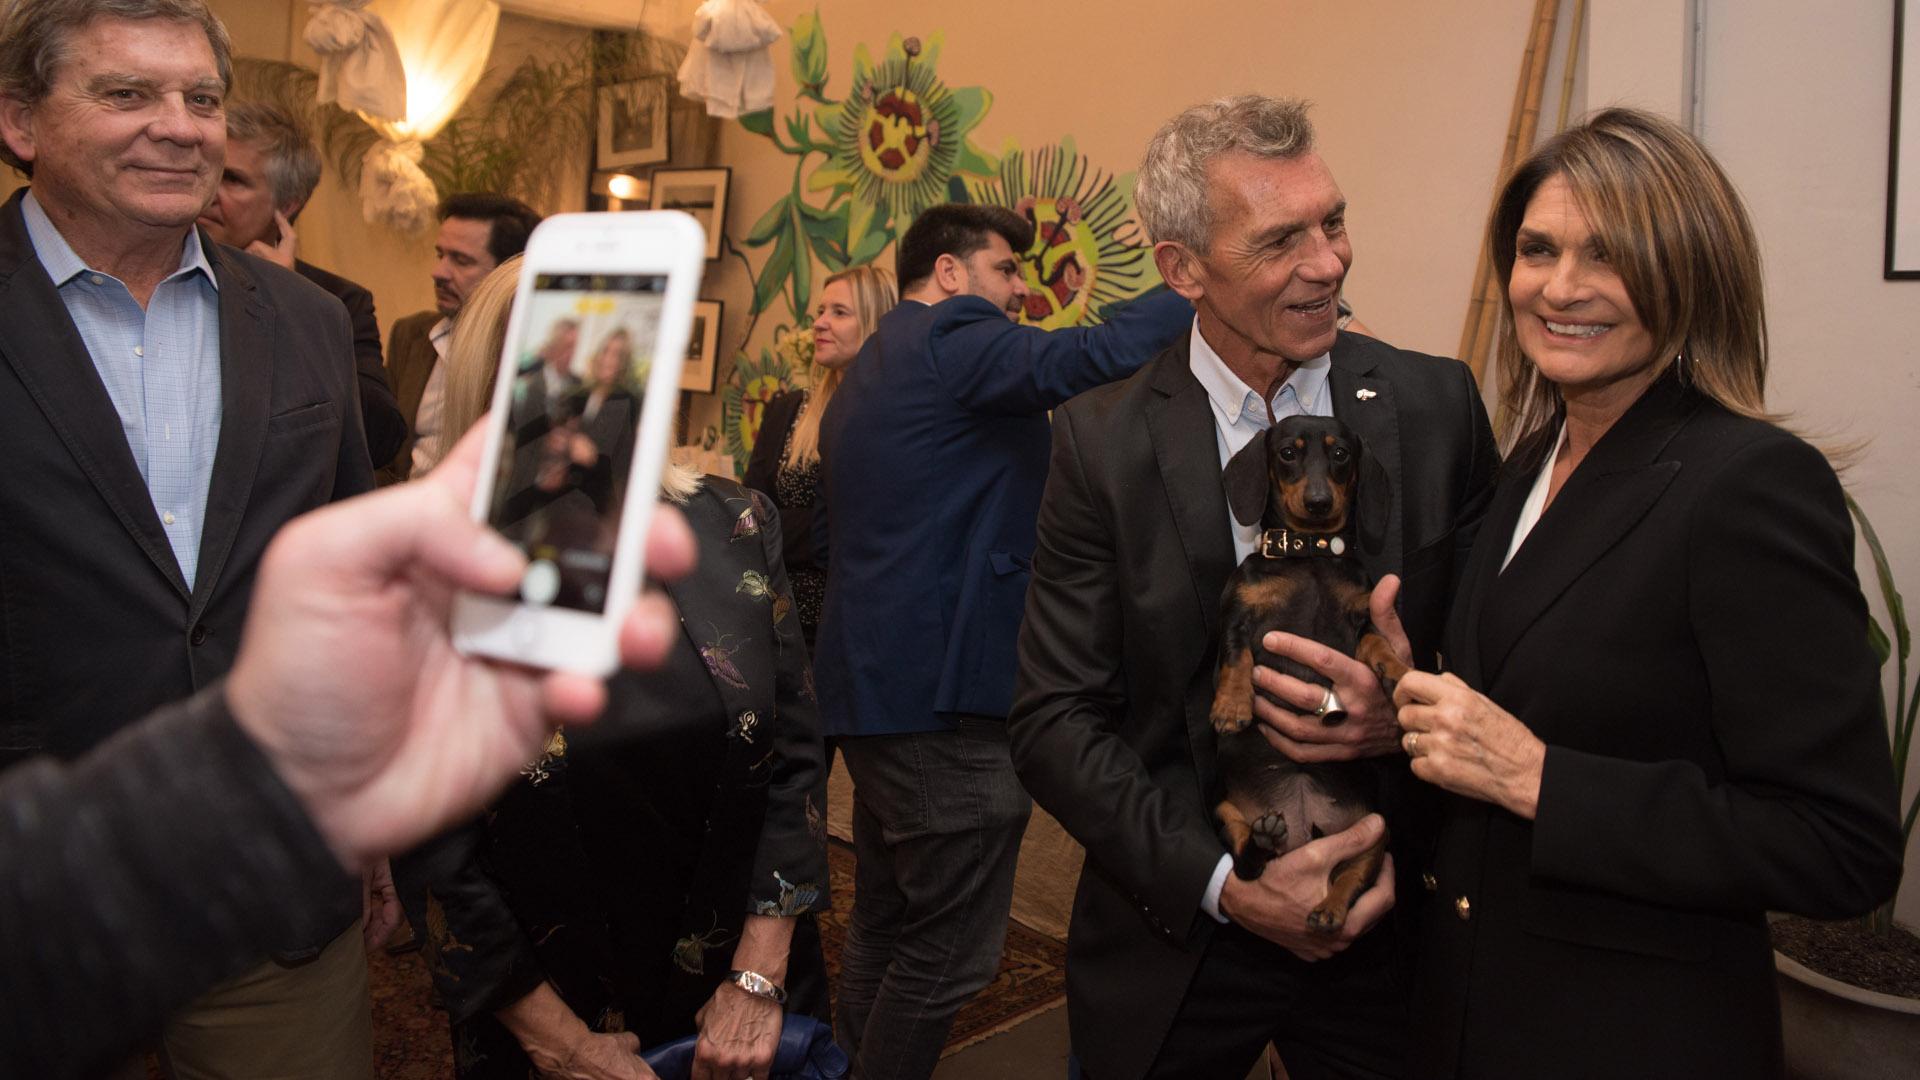 Ricardo Piñeiro posa para la foto con Amelie y Teresa Calandra